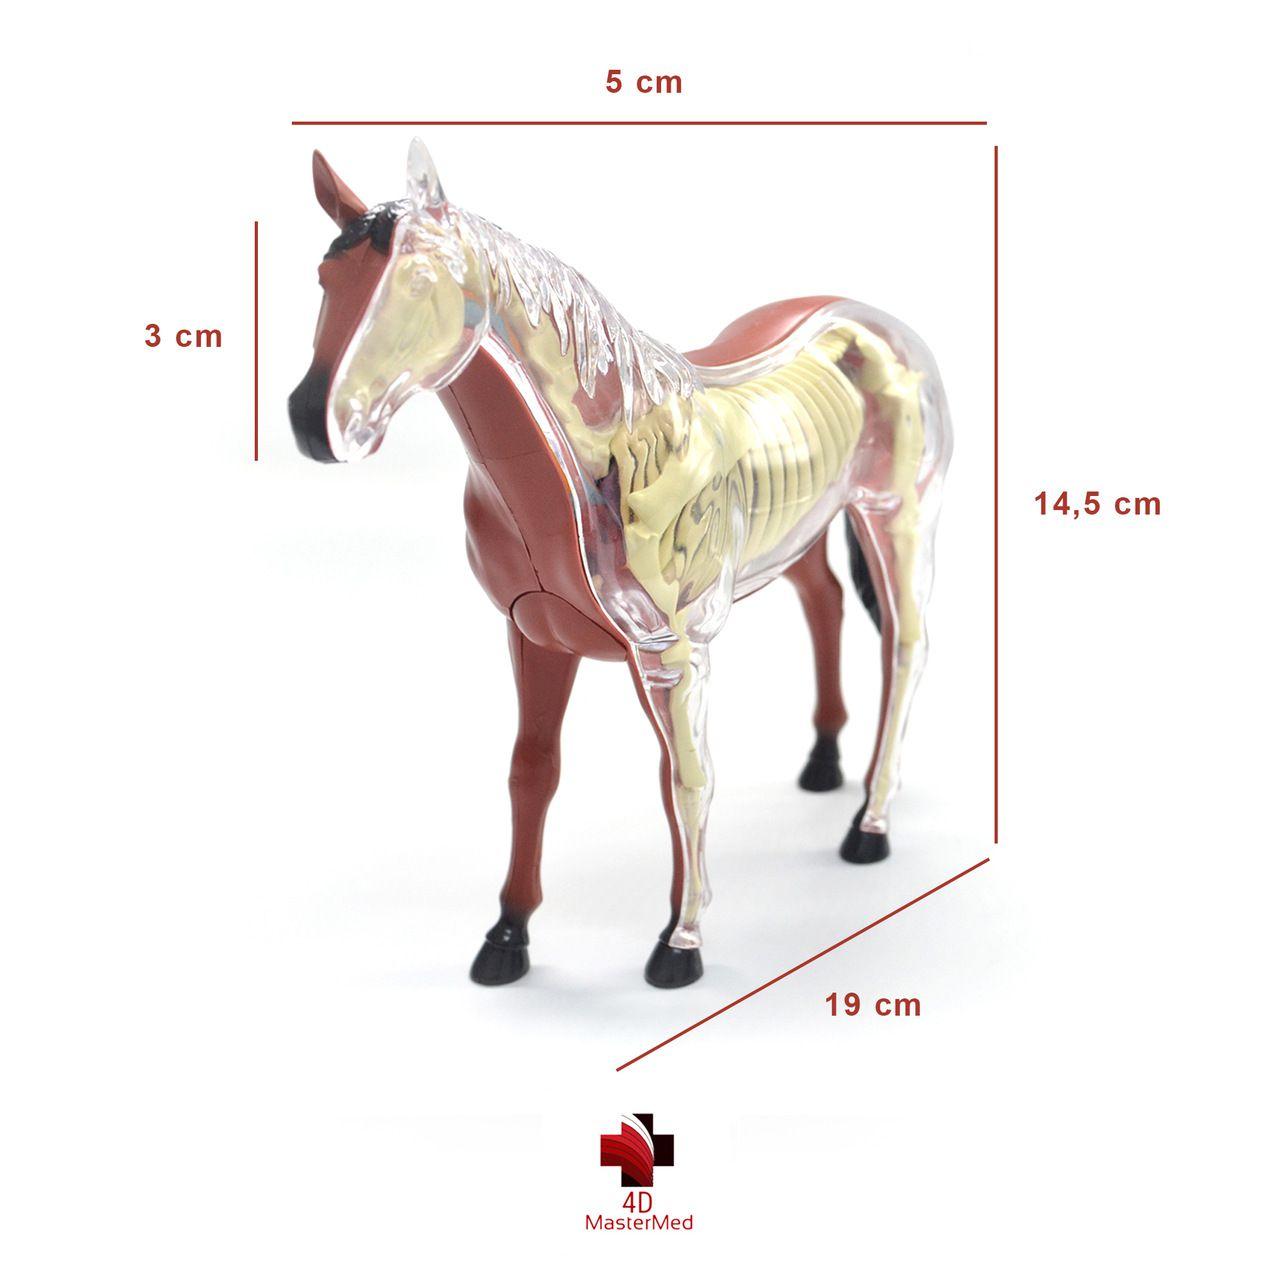 Anatomia do Cavalo